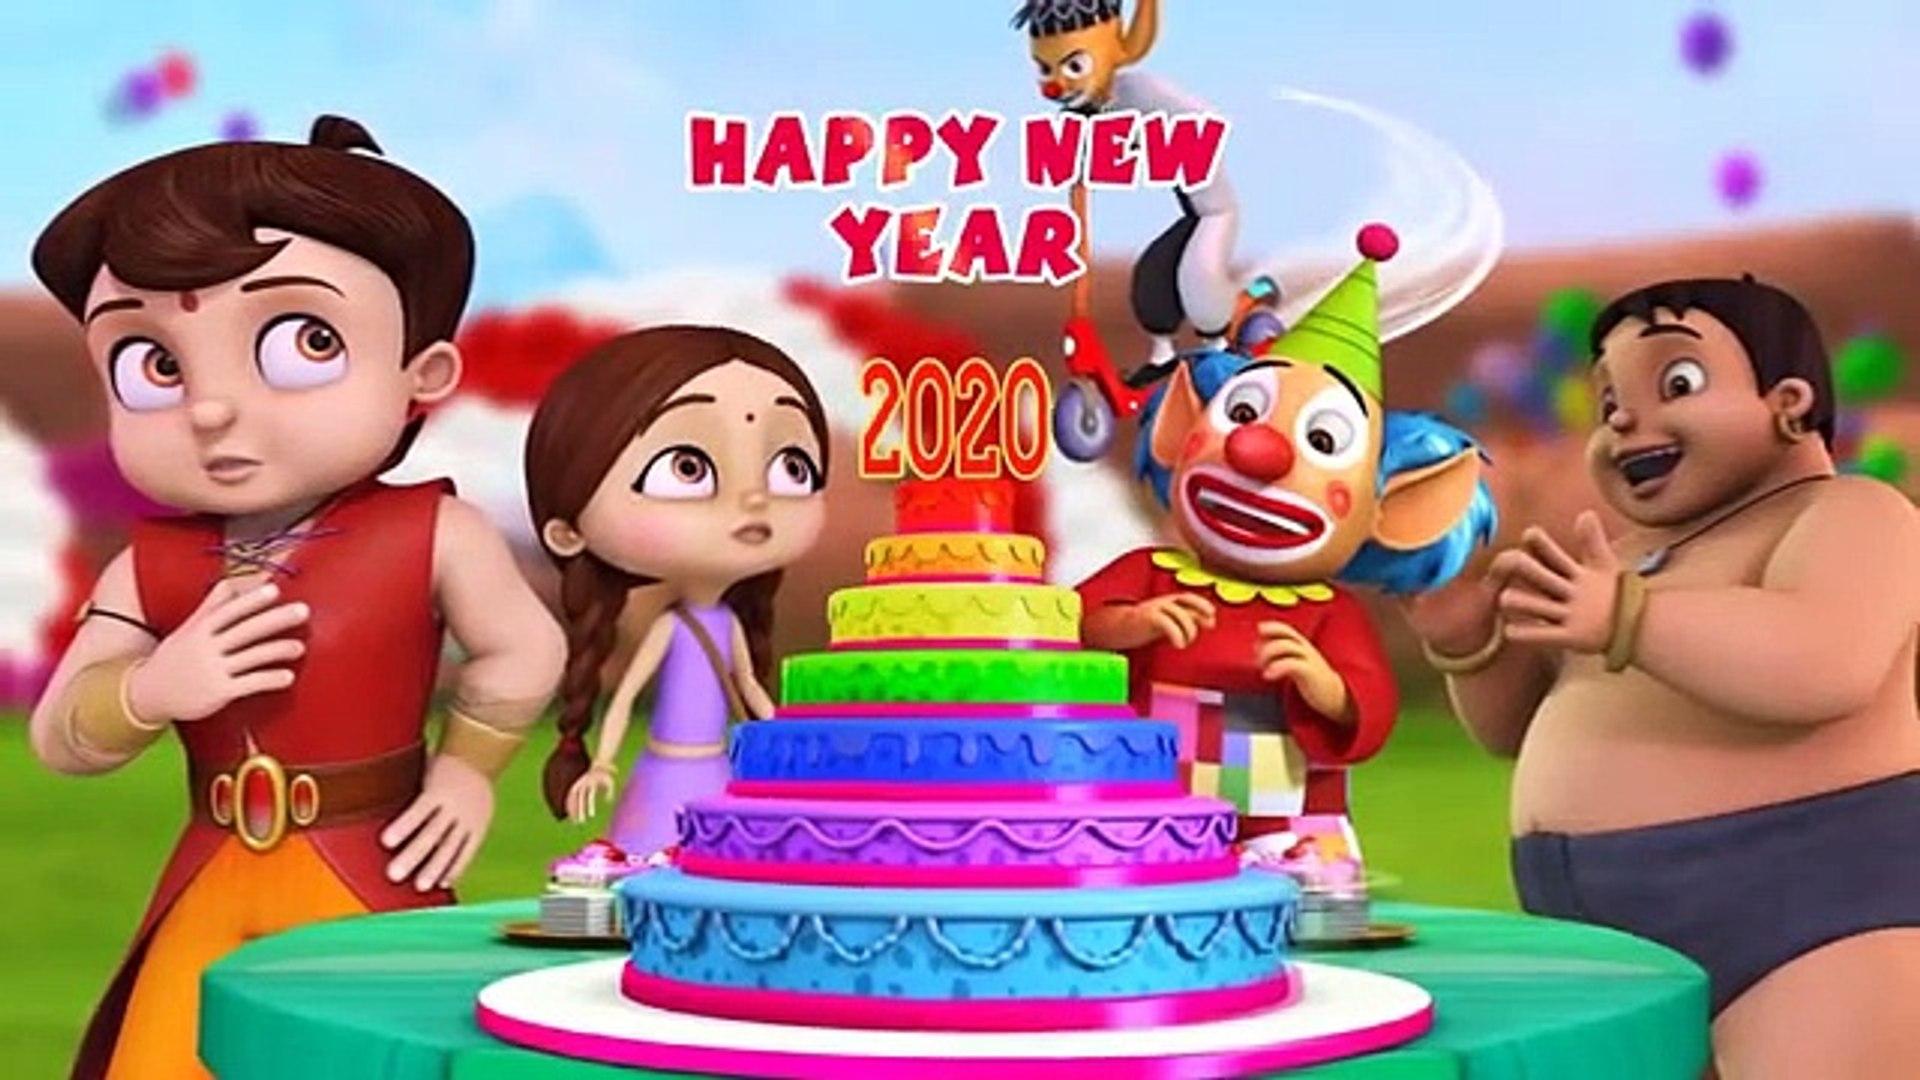 Super Bheem - The New Year Party 2020 - Hindi Cartoon for Kids - Bheem Cartoon Stories